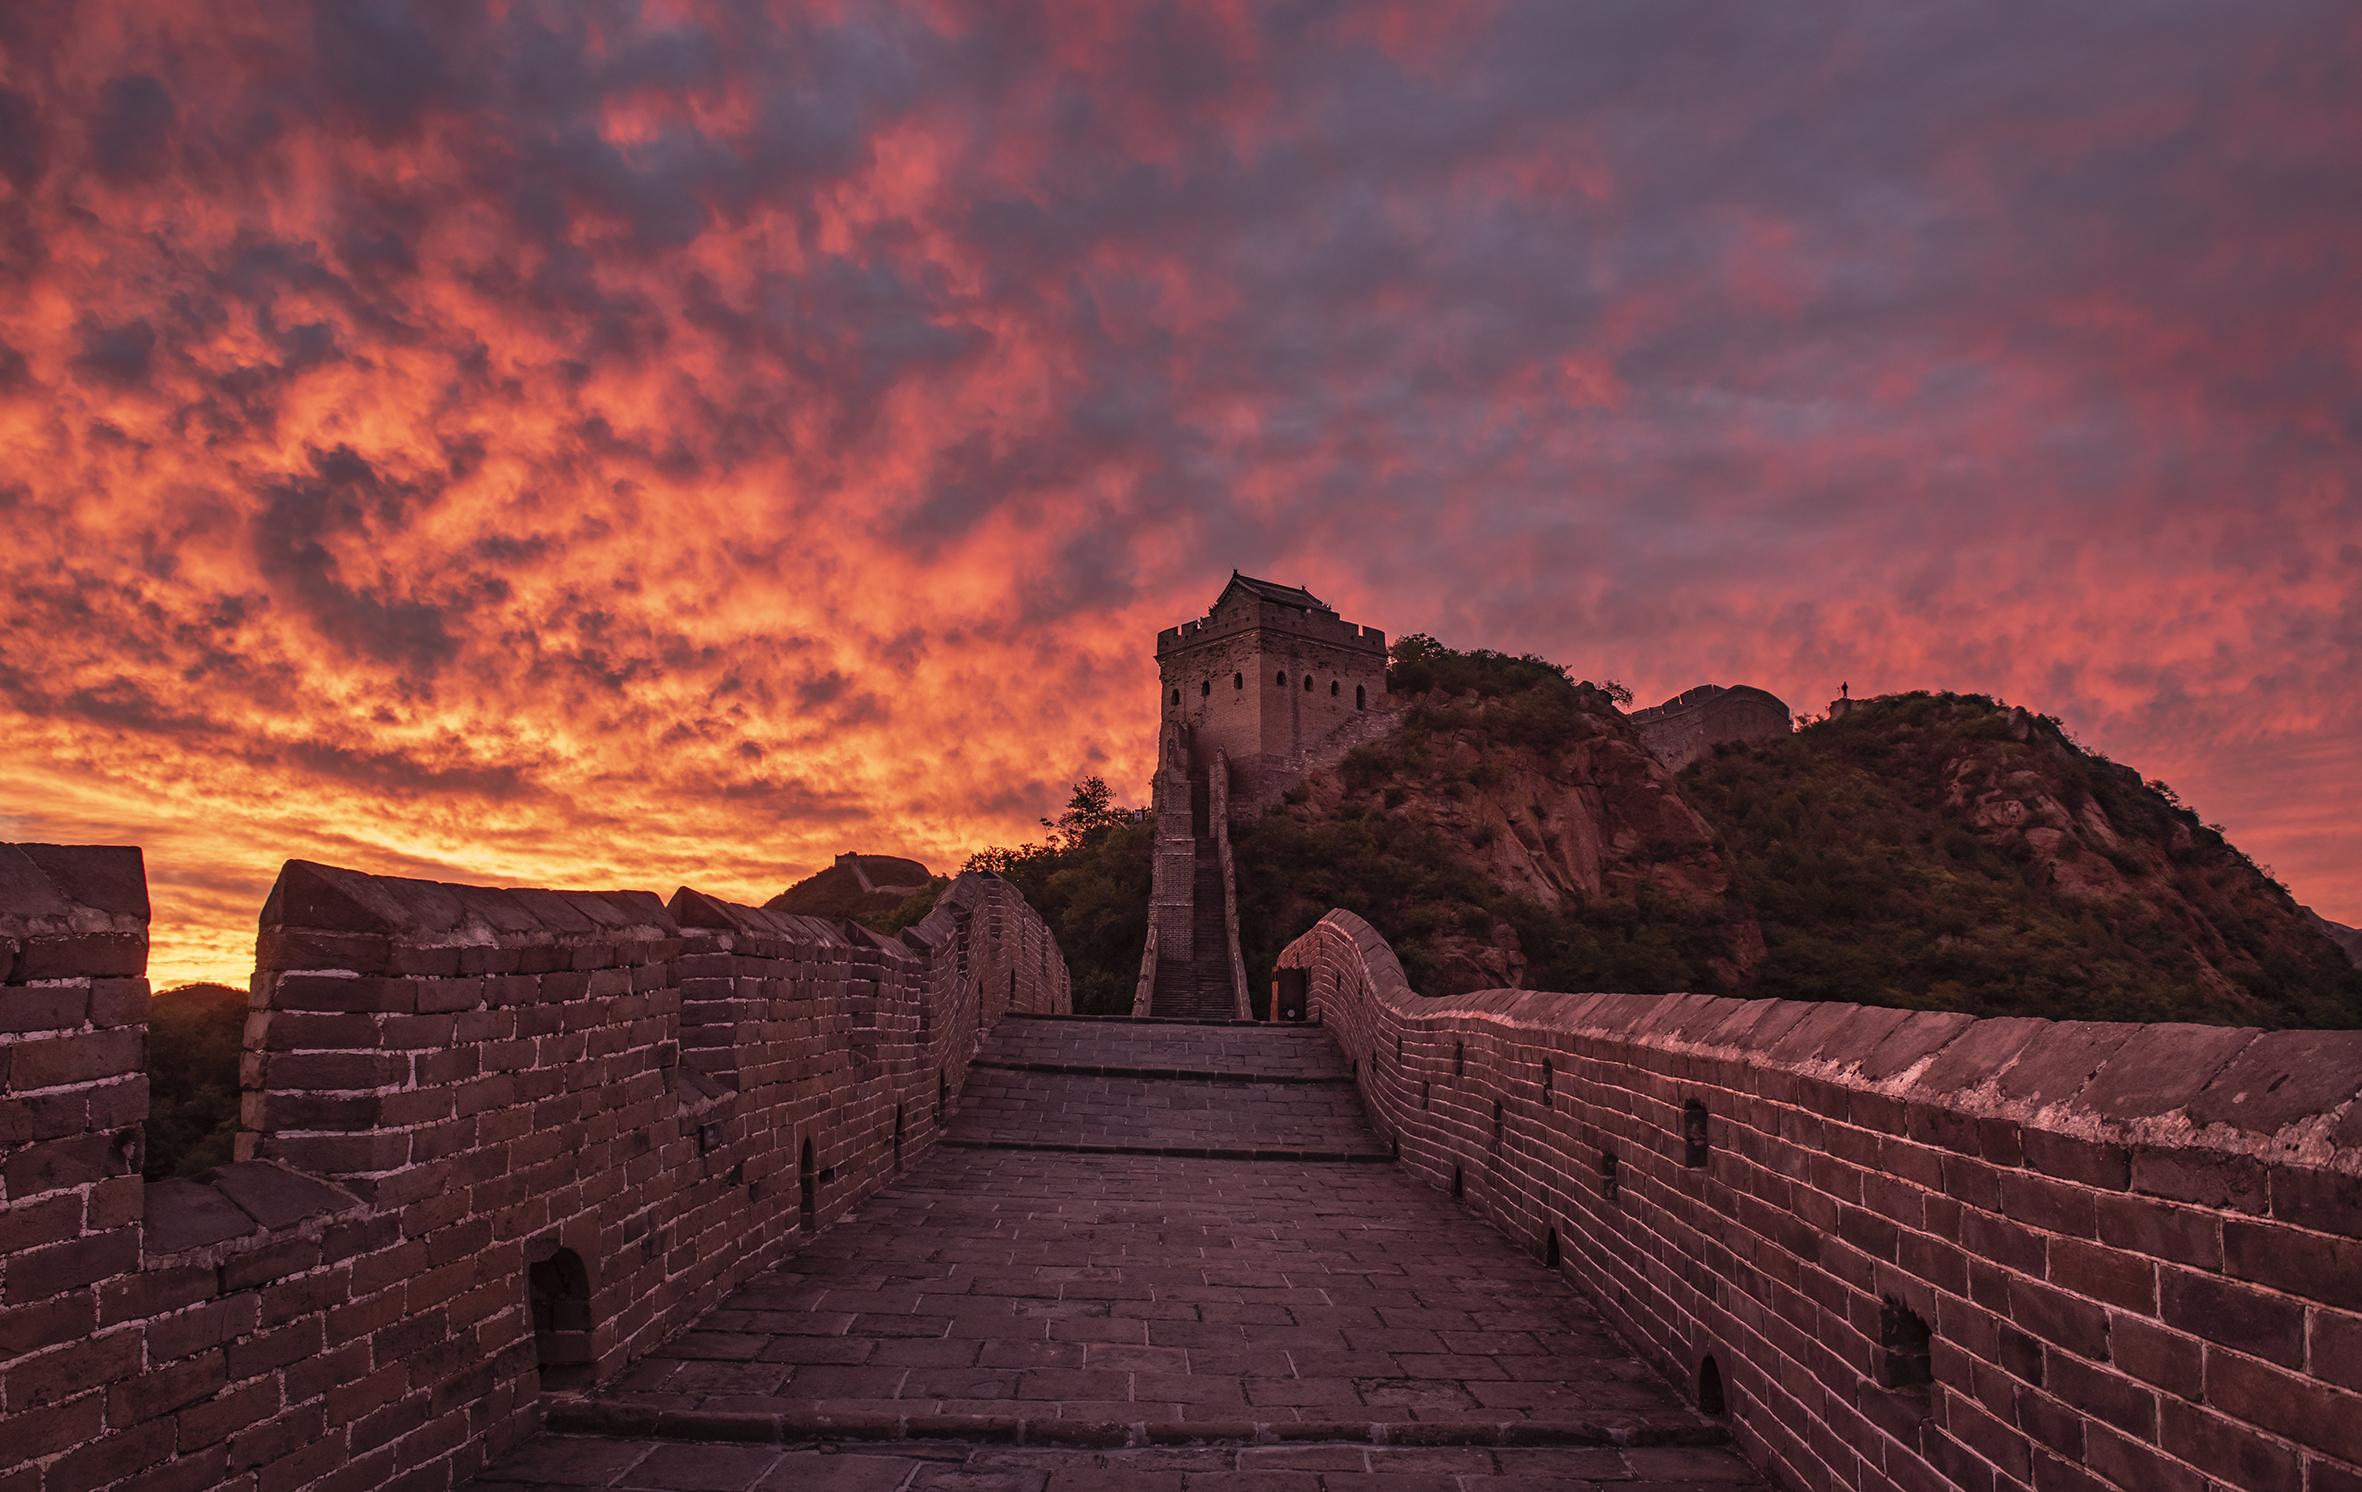 Spectacular morning glow lights up the Jinshanling Great Wall